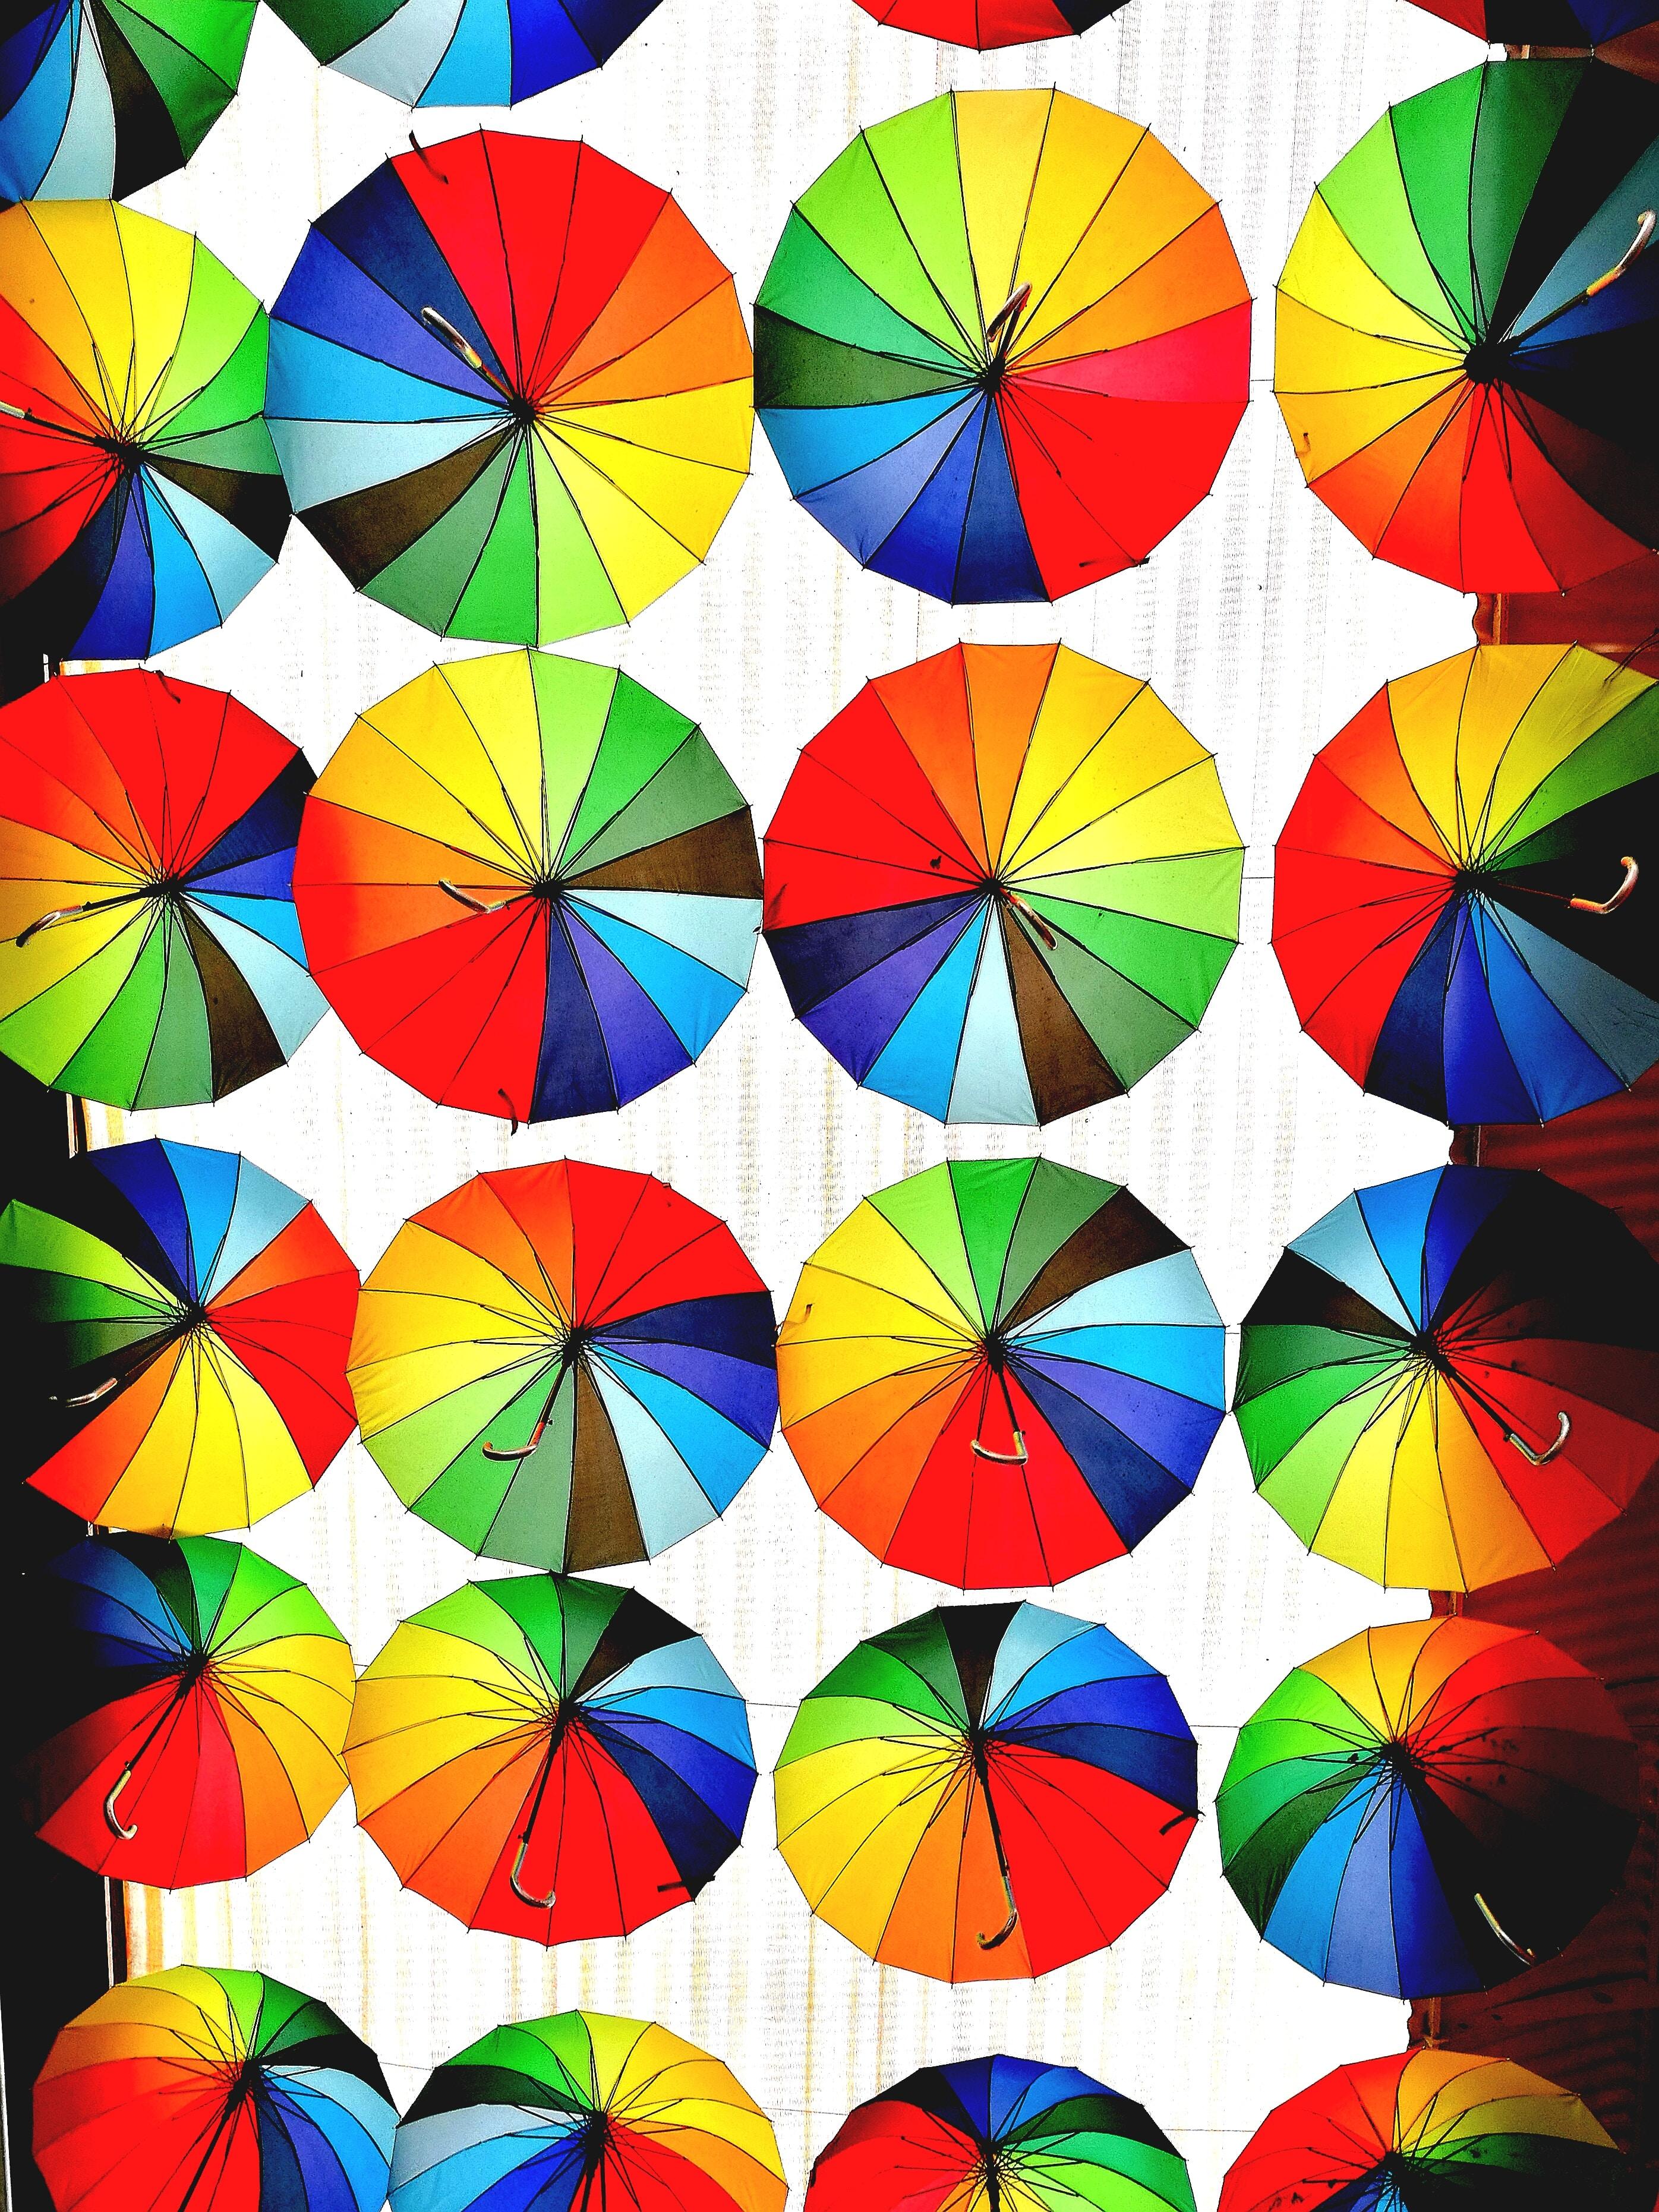 hanging umbrella decors